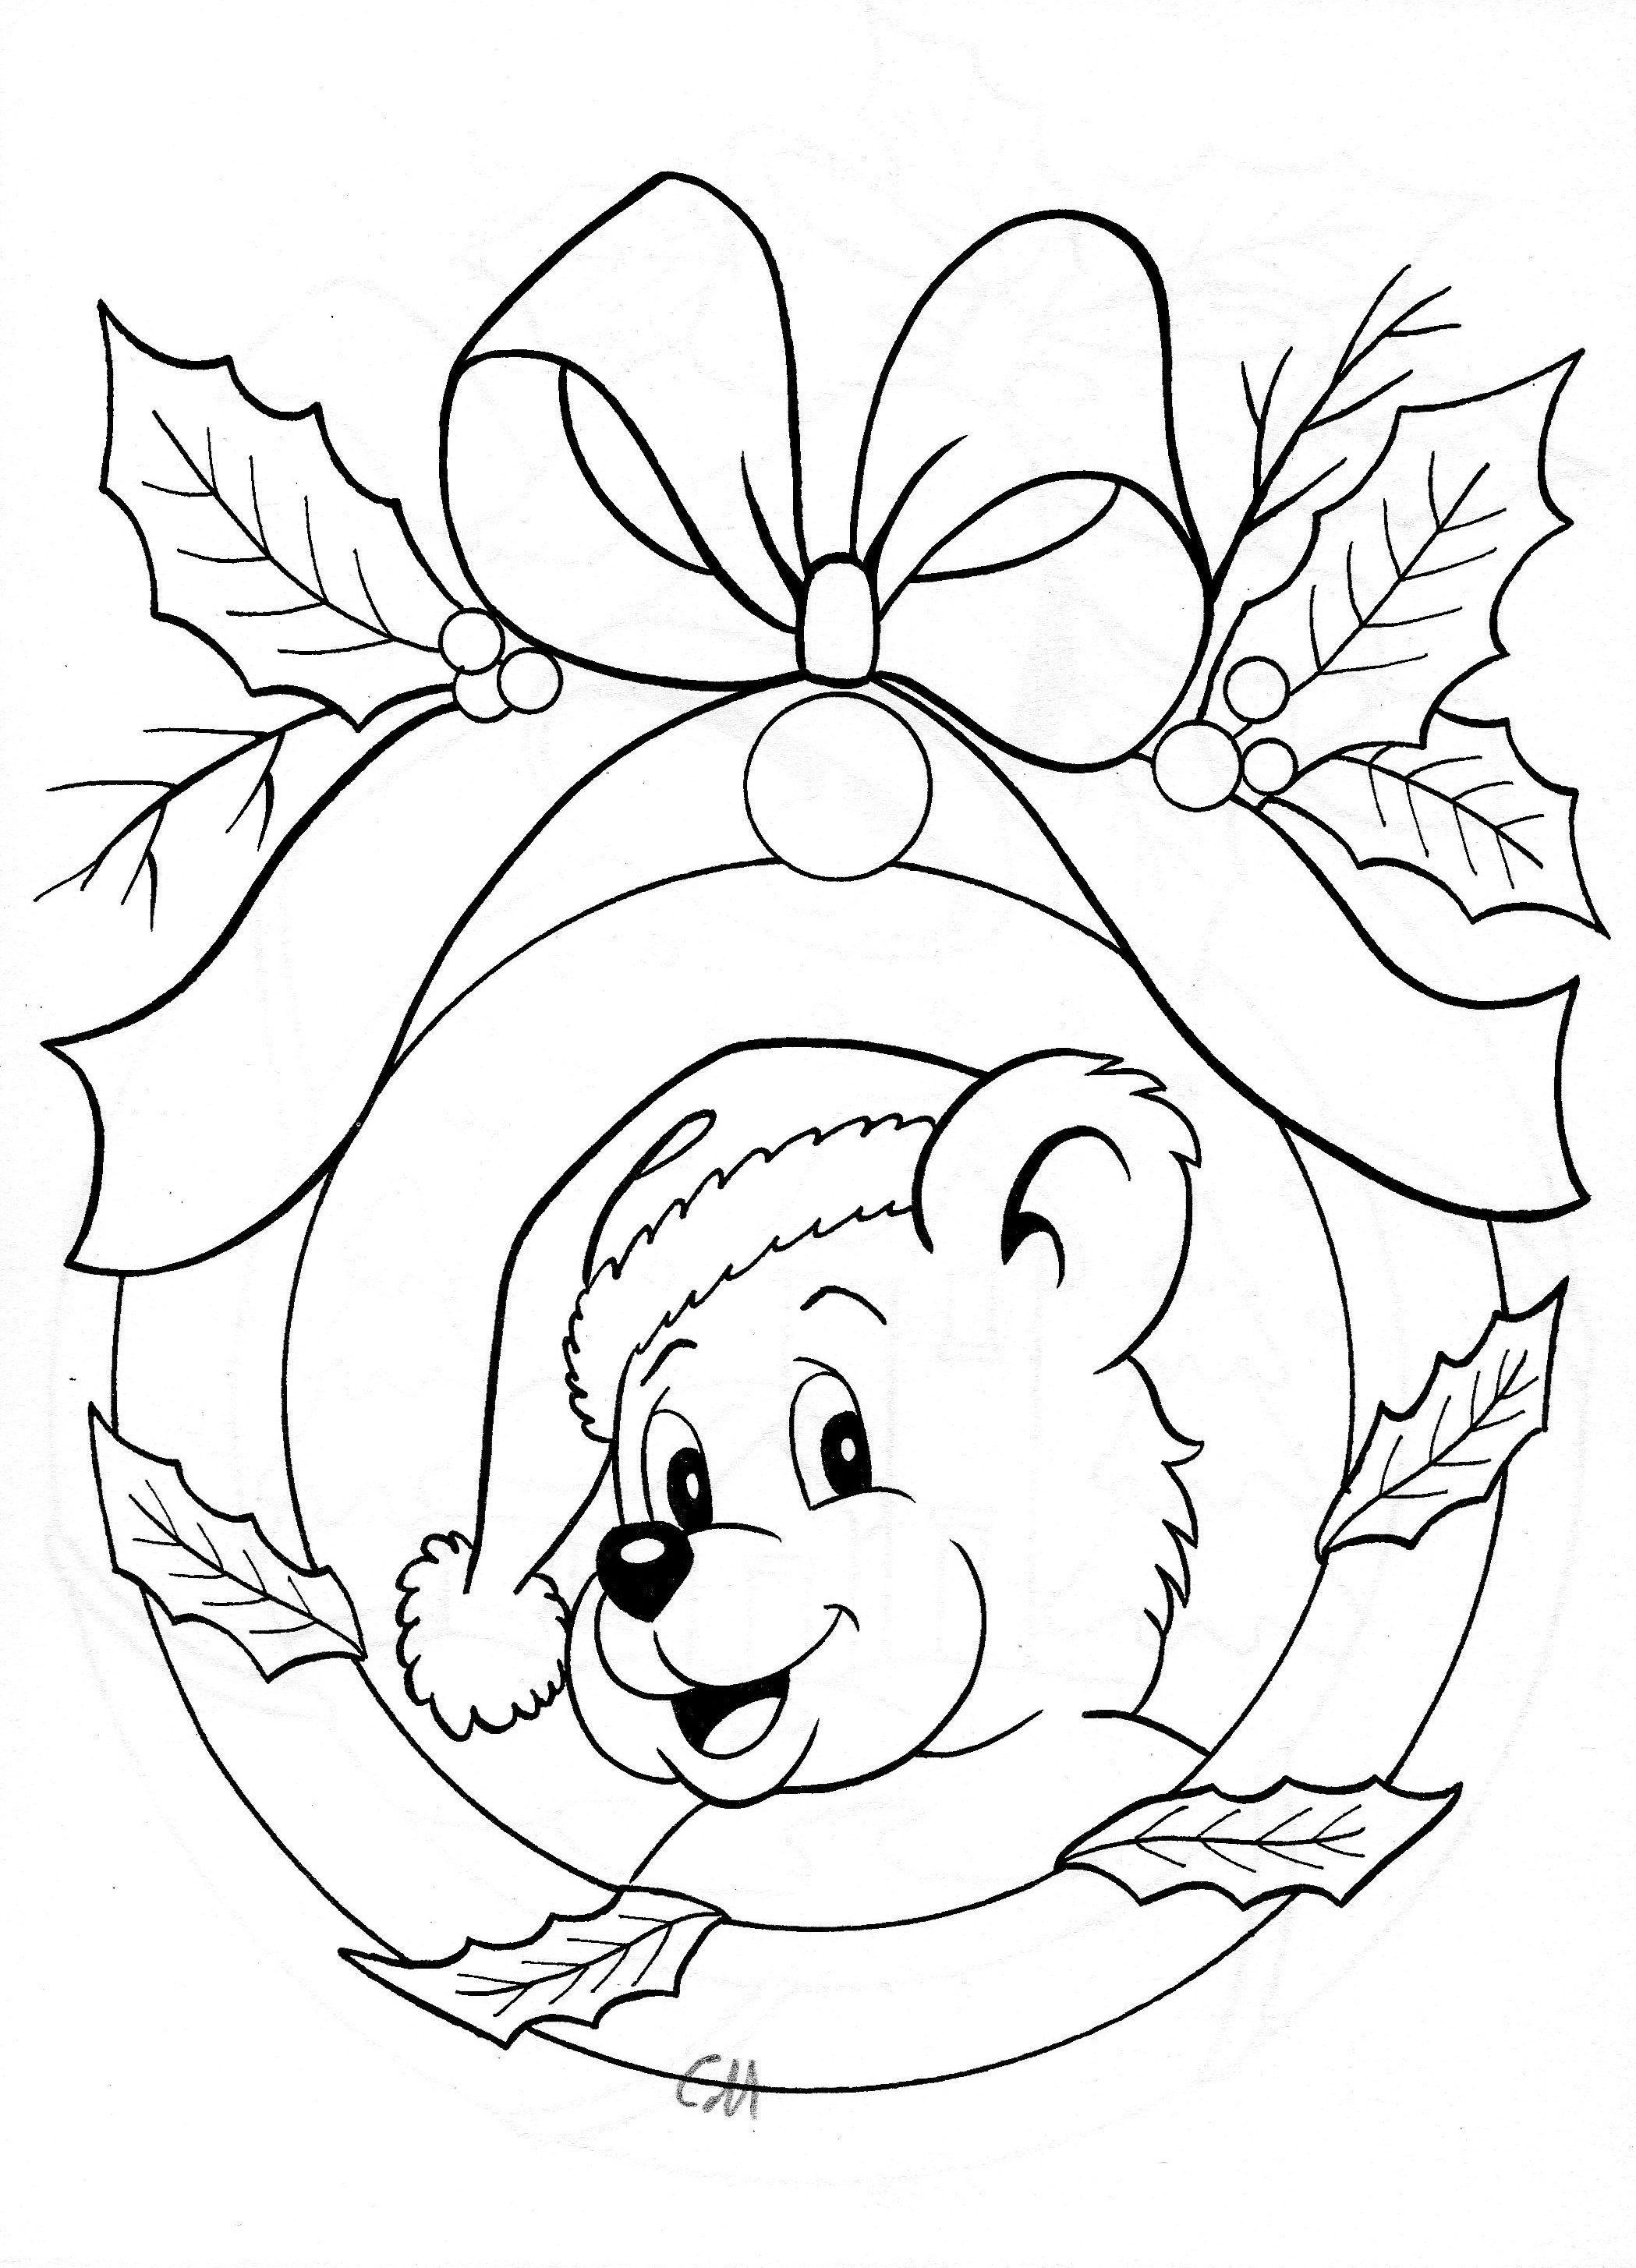 Bear ornaments | Сказки | Pinterest | Dibujos para pintar, Navidad y ...